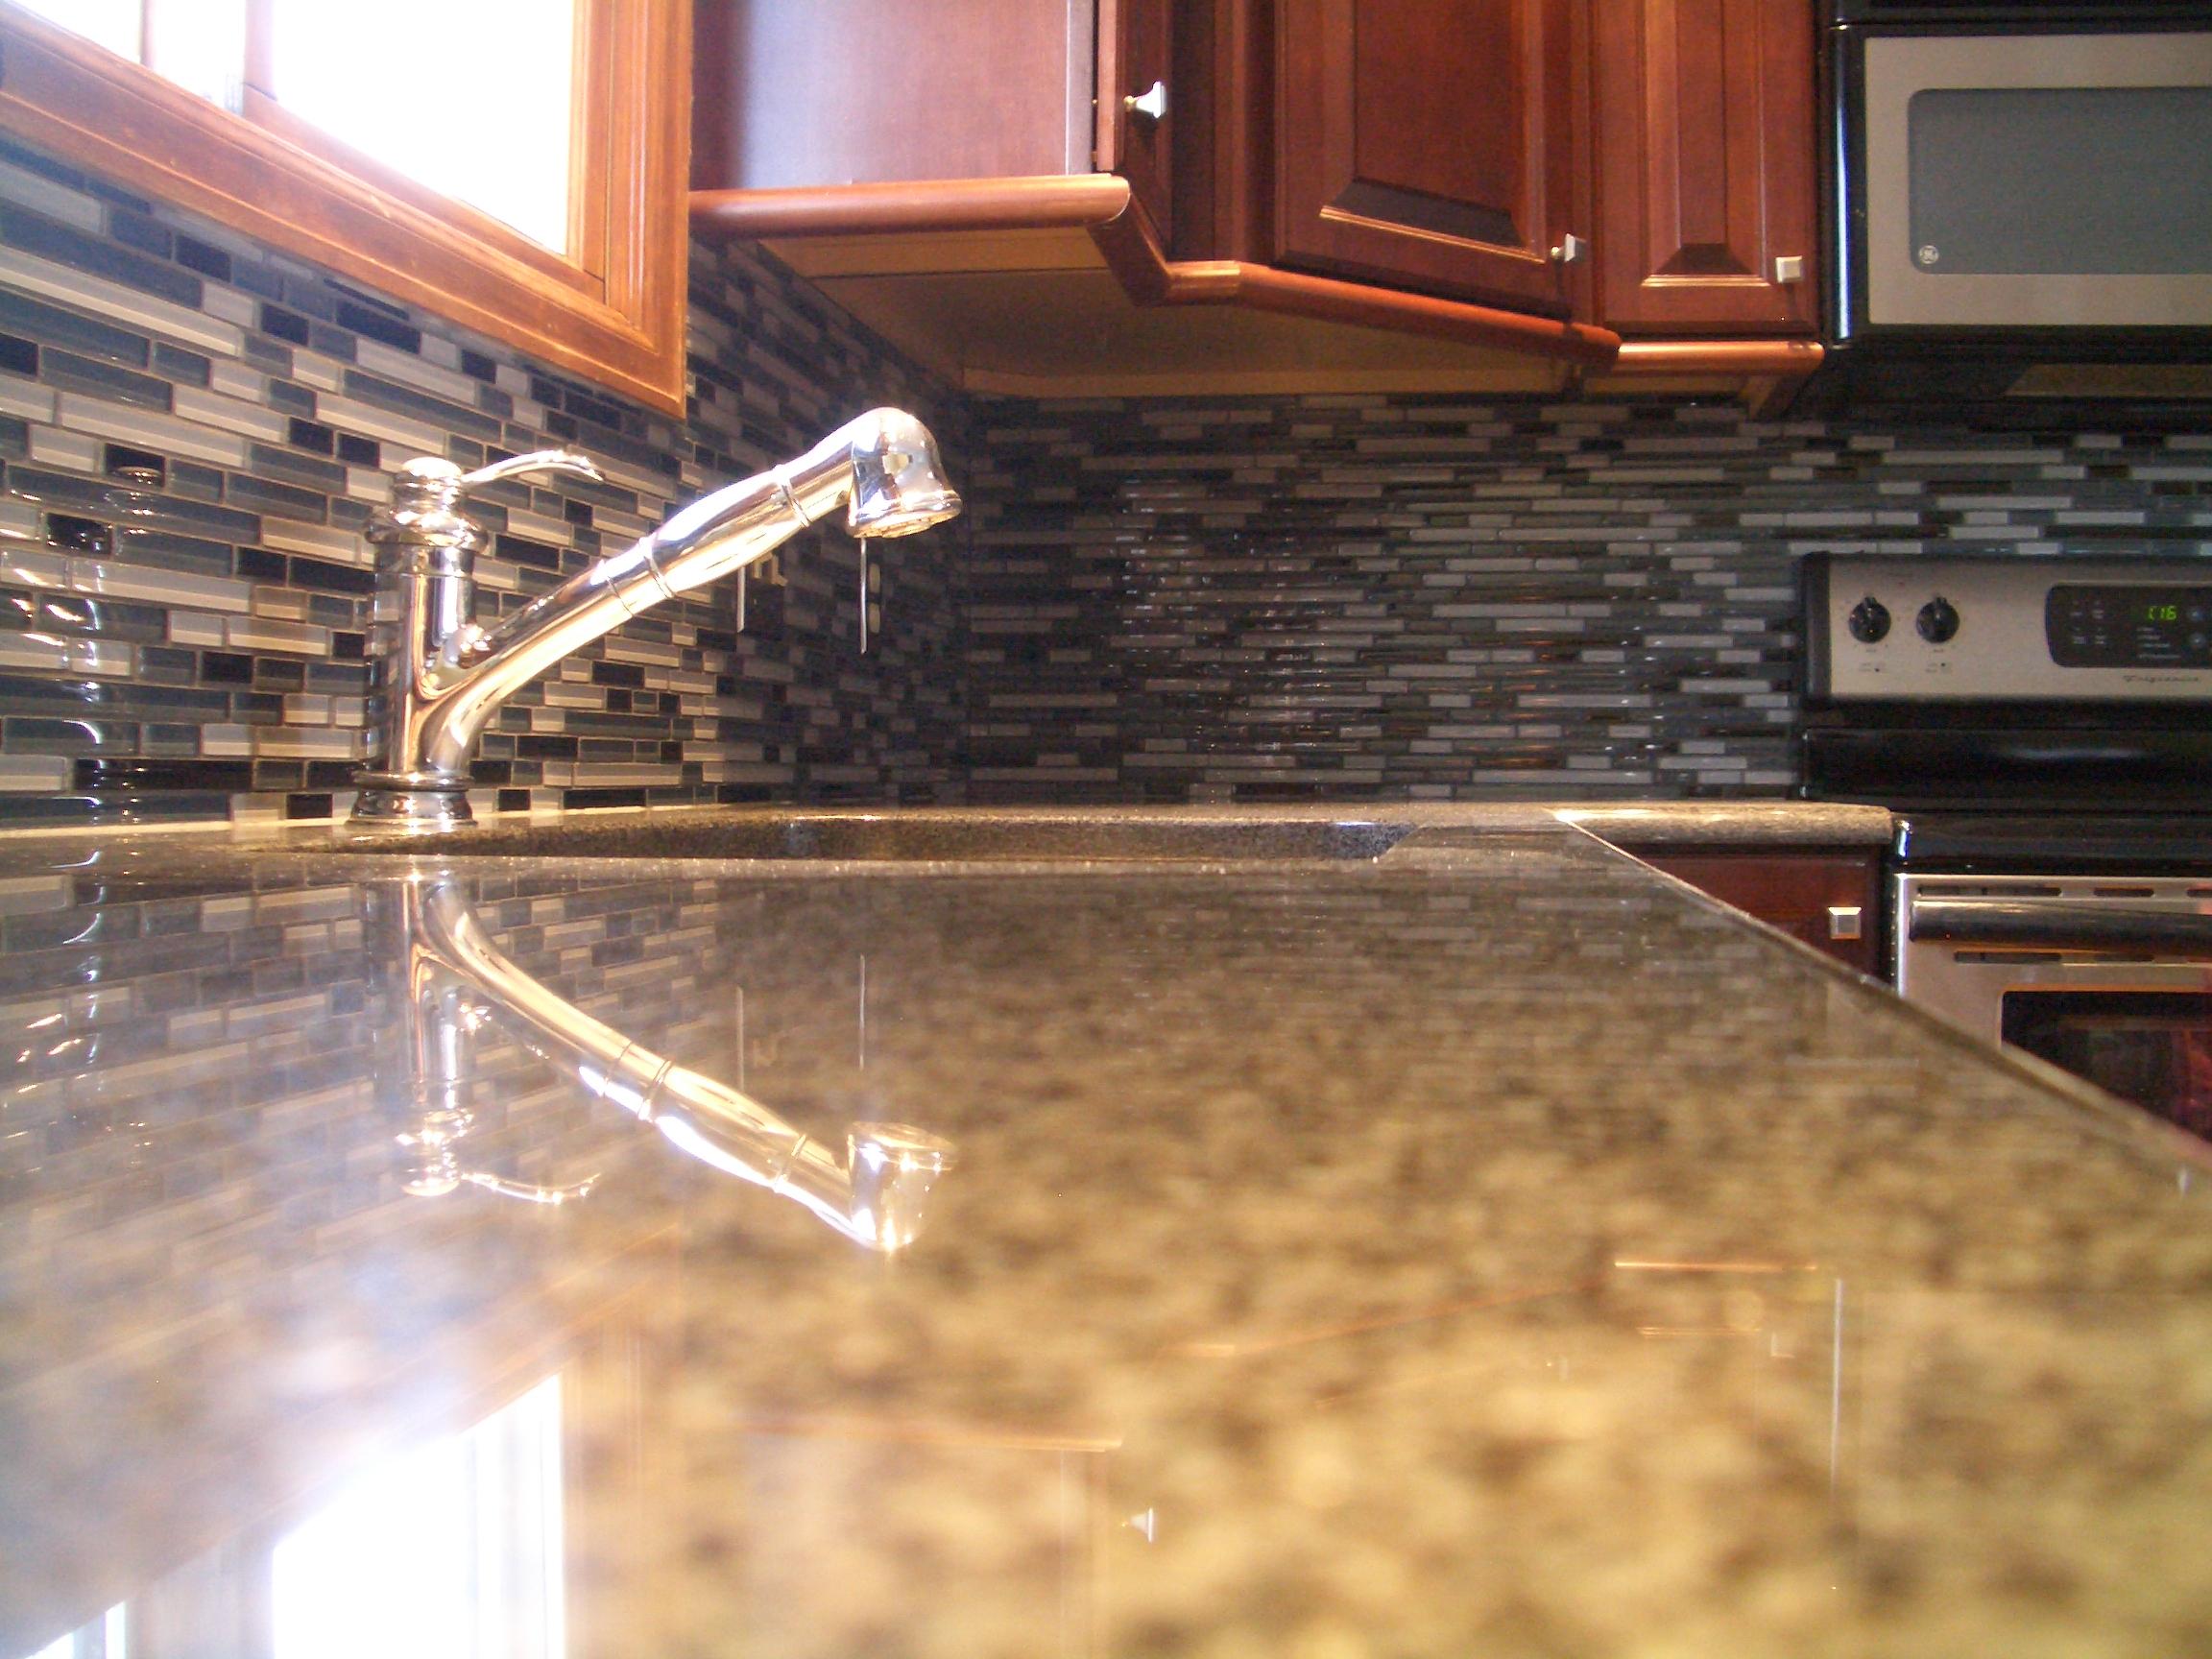 glass tile kitchen backsplash special glass tile kitchen backsplash Grey stack glass tile backsplash